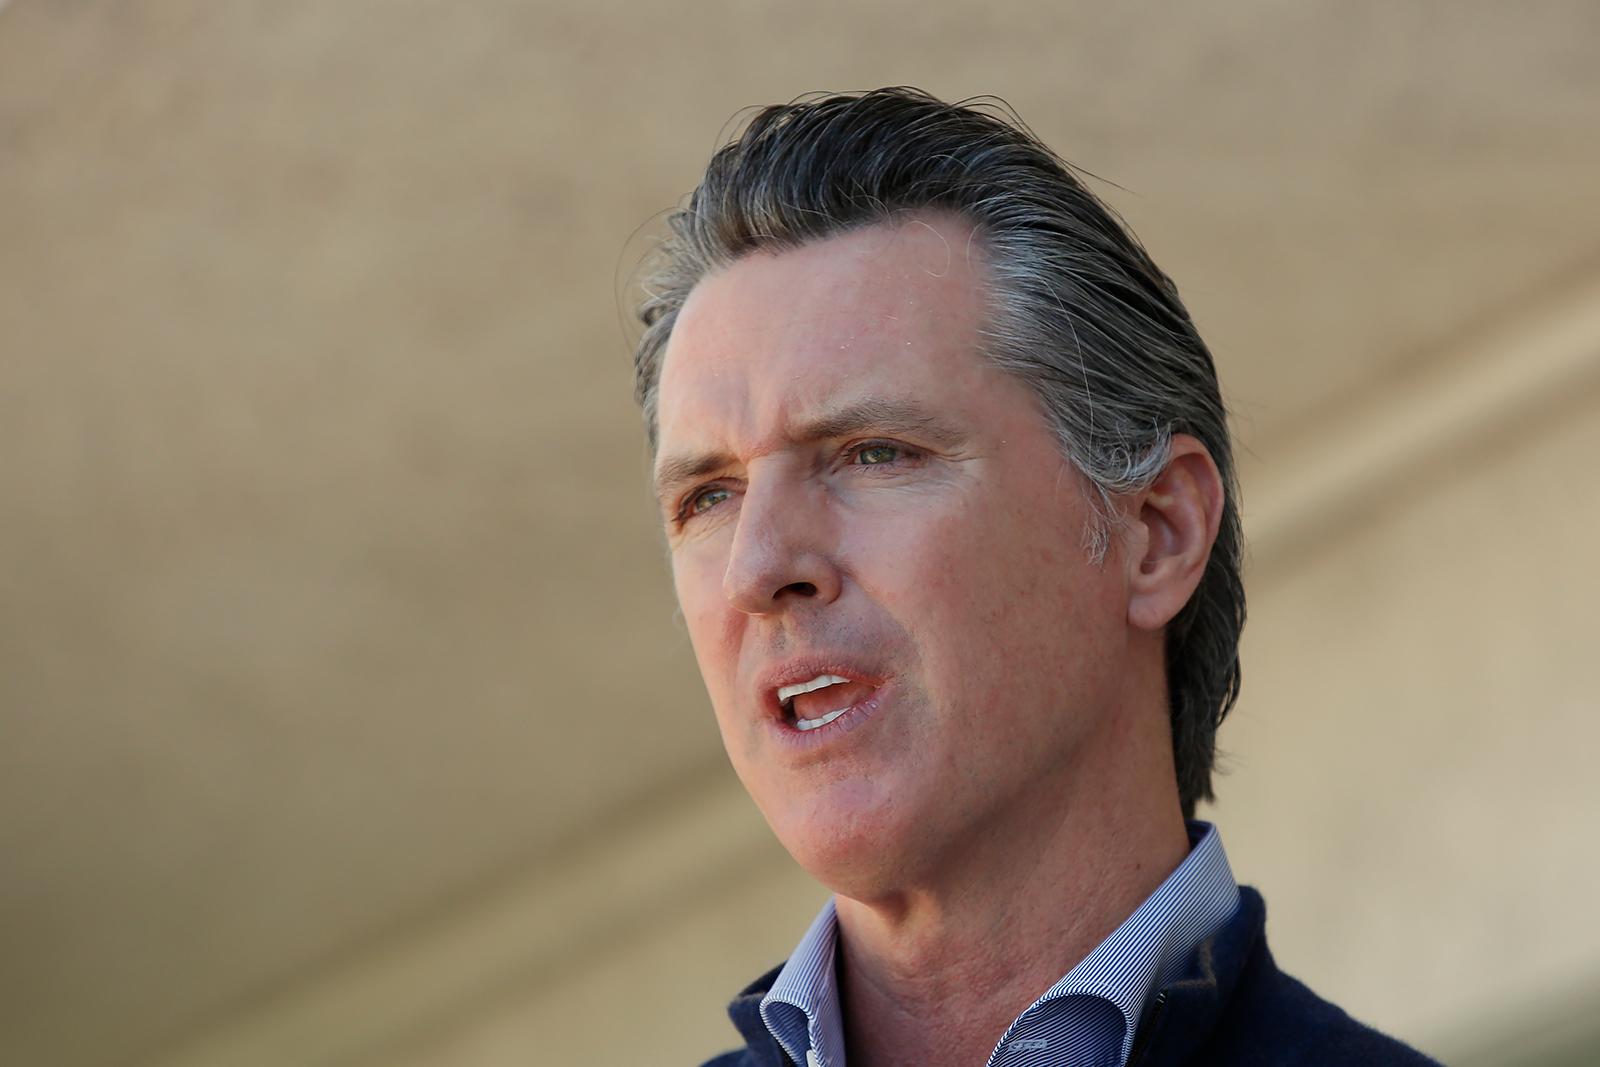 California Gov. Gavin Newsom speaks in Pittsburg, California on June 30.